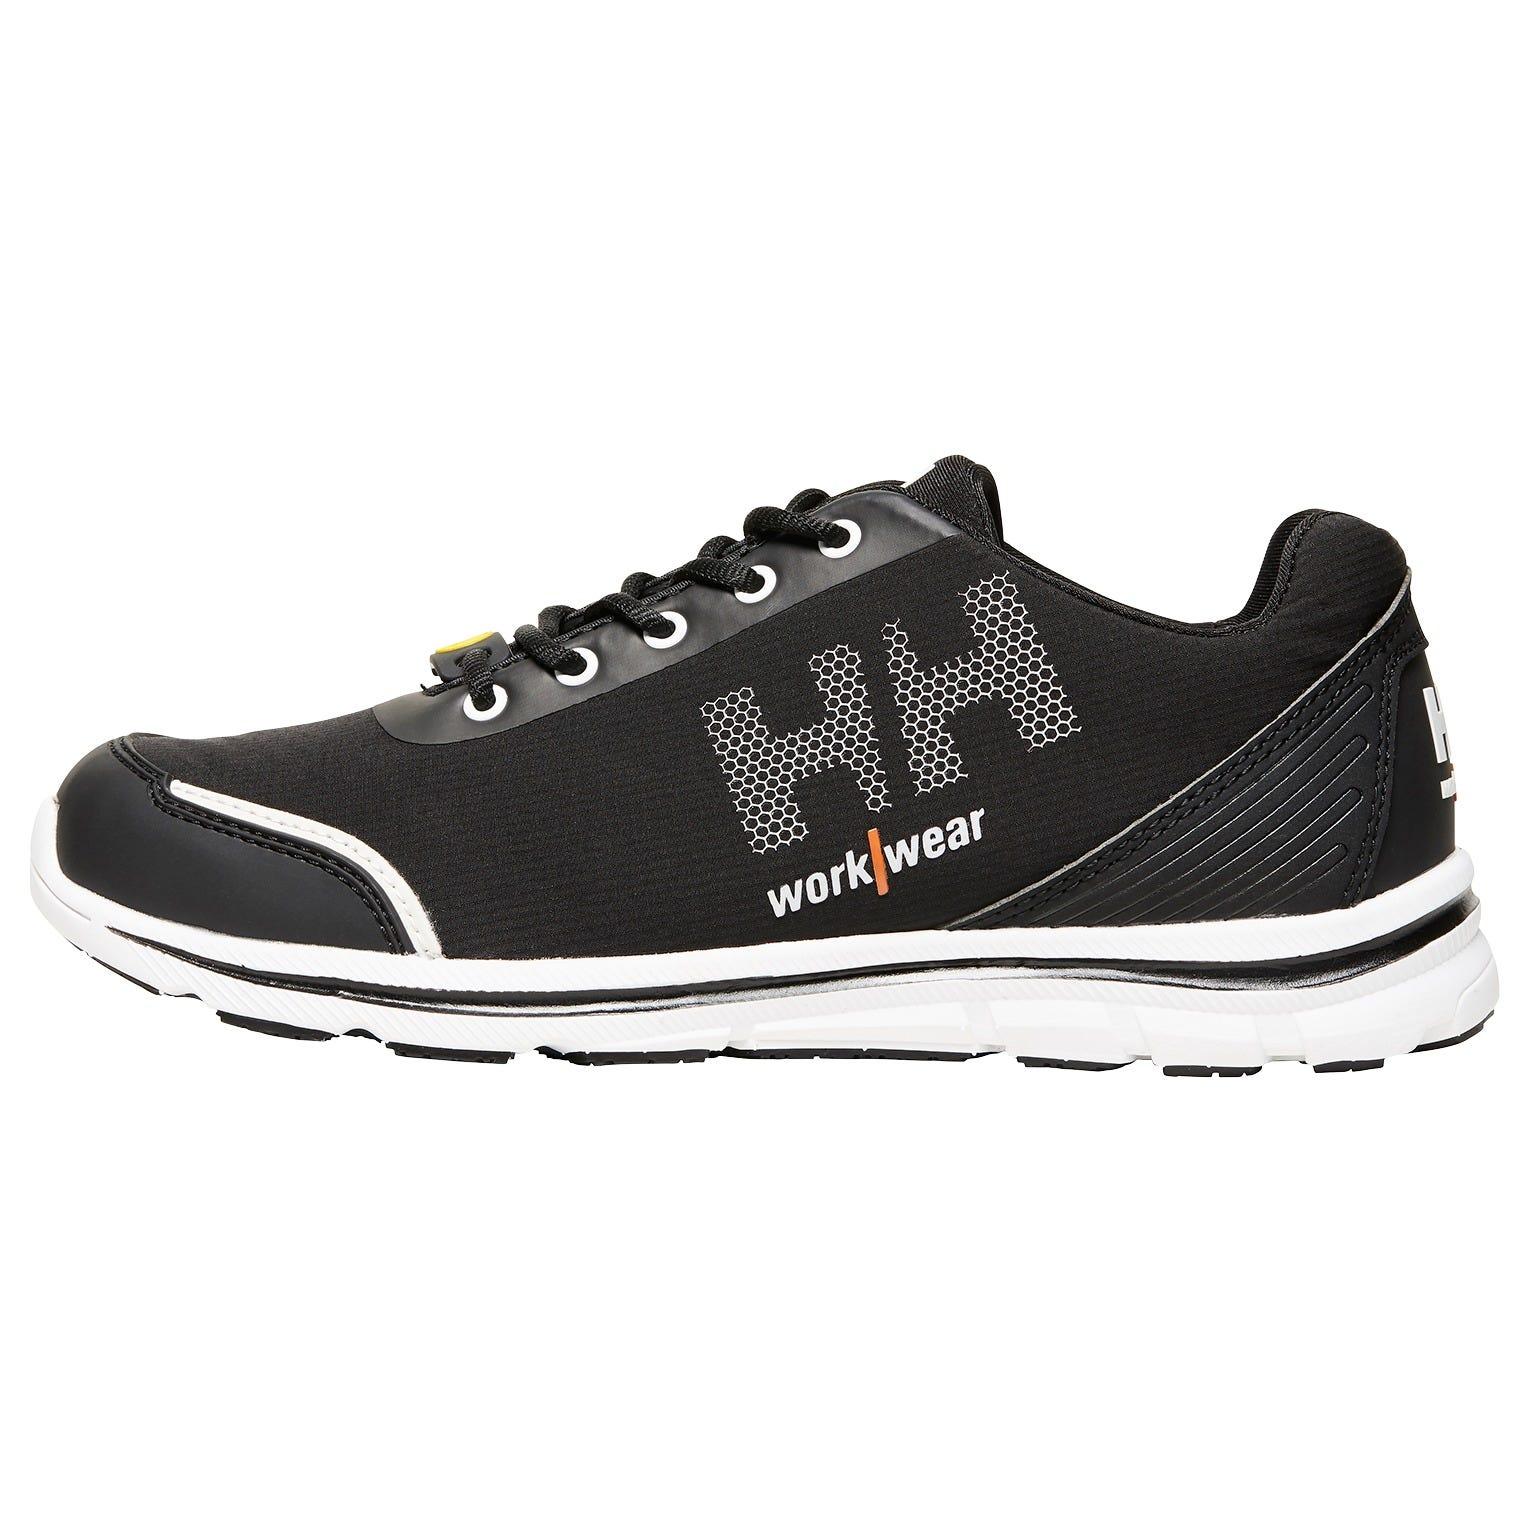 hh workwear workwear helly hansen scarpa antinfortunistica oslo st certificata o1 antiscivolo 45 nero